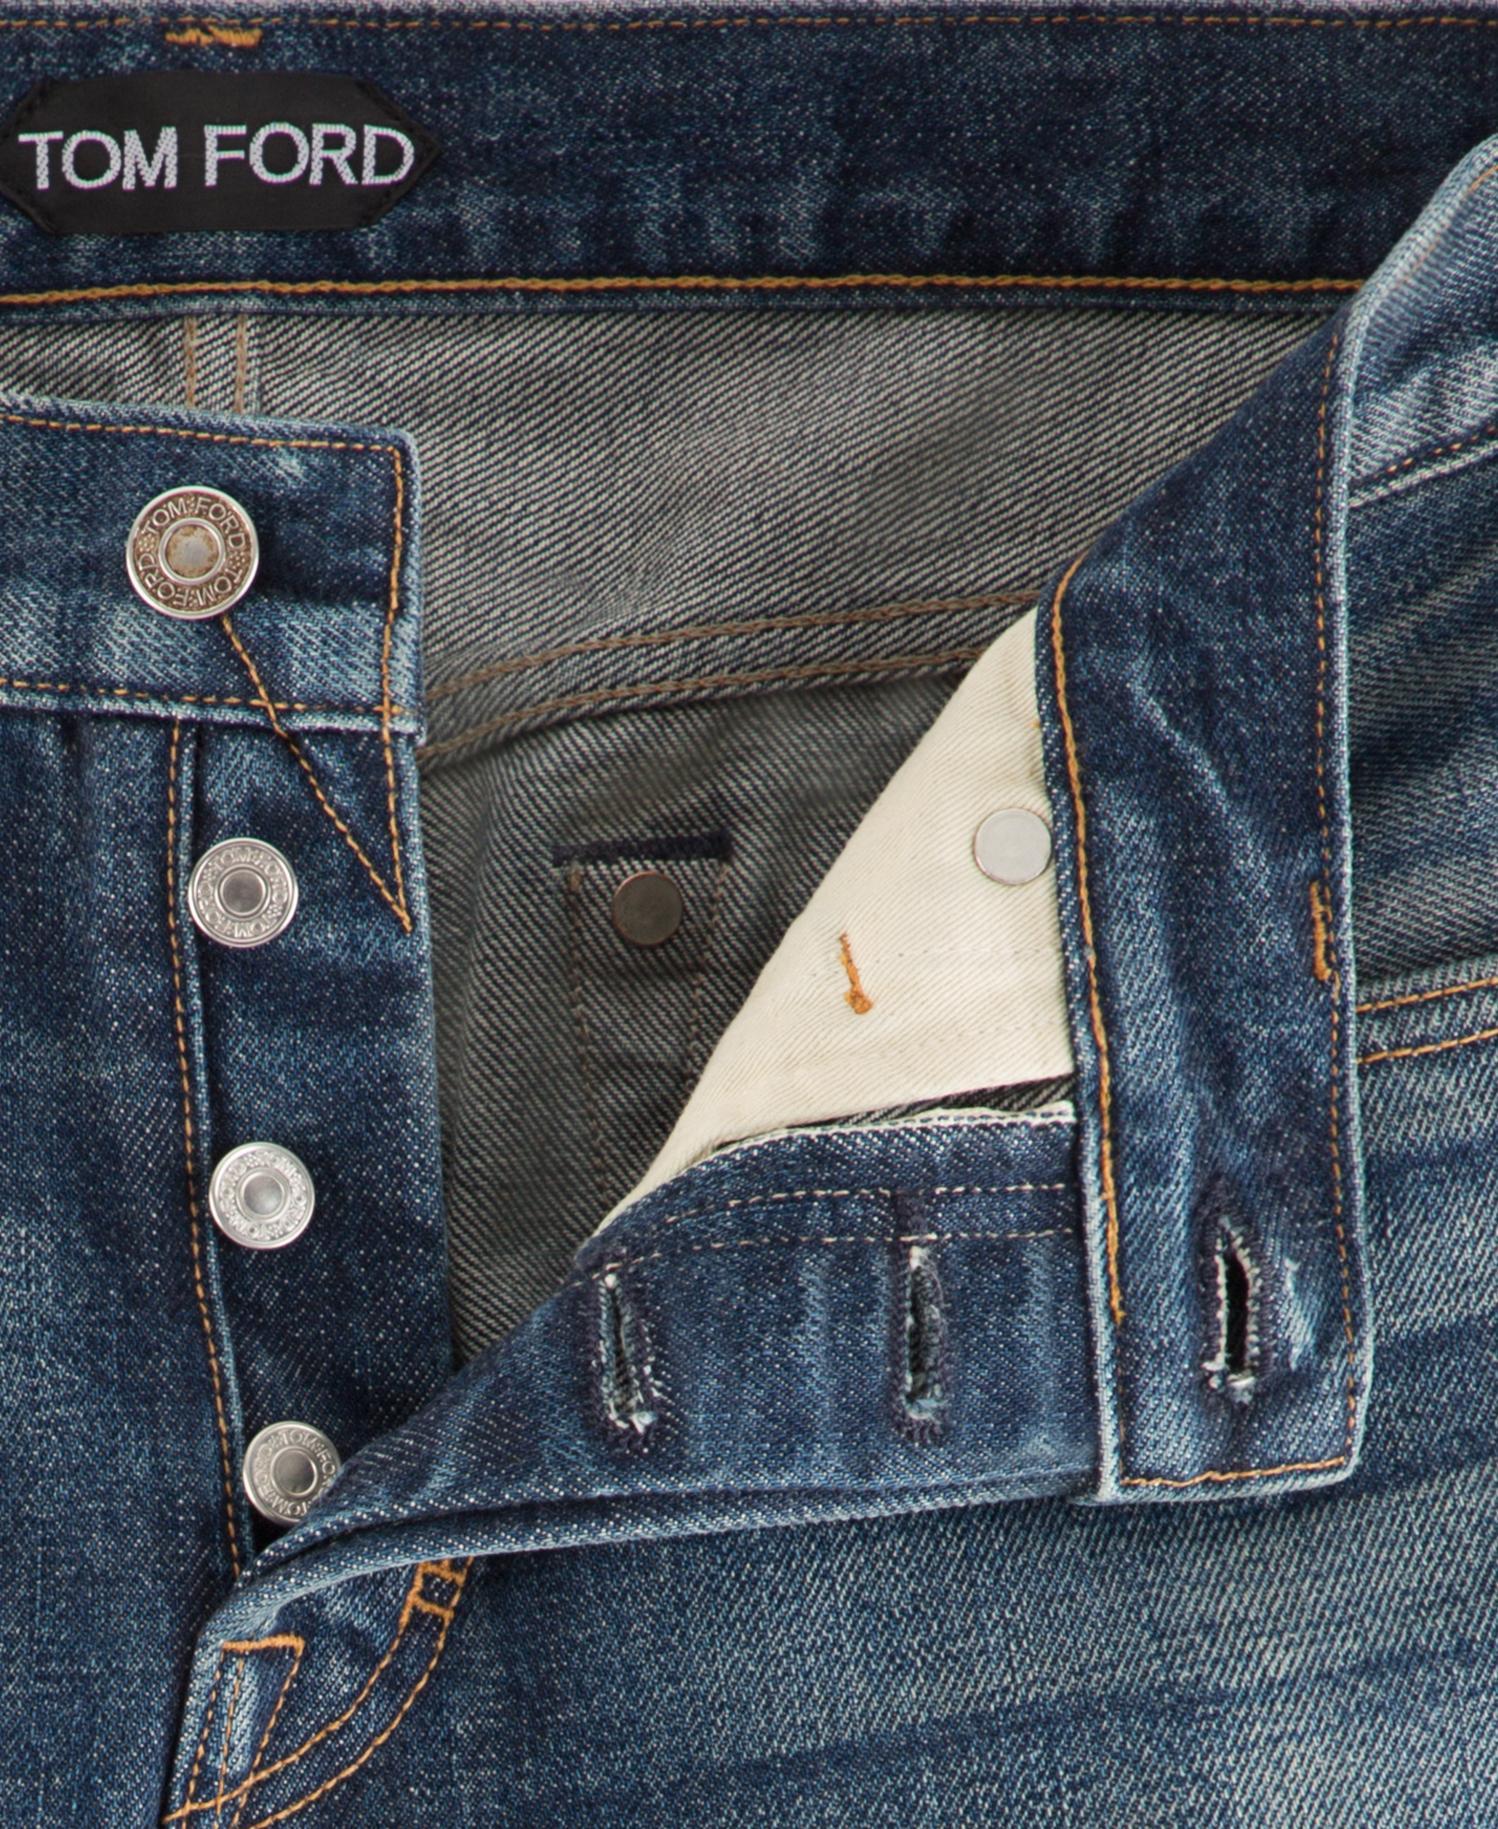 30 U.S Pants New TOM FORD Slim Beige Jeans TFD001 Size 46